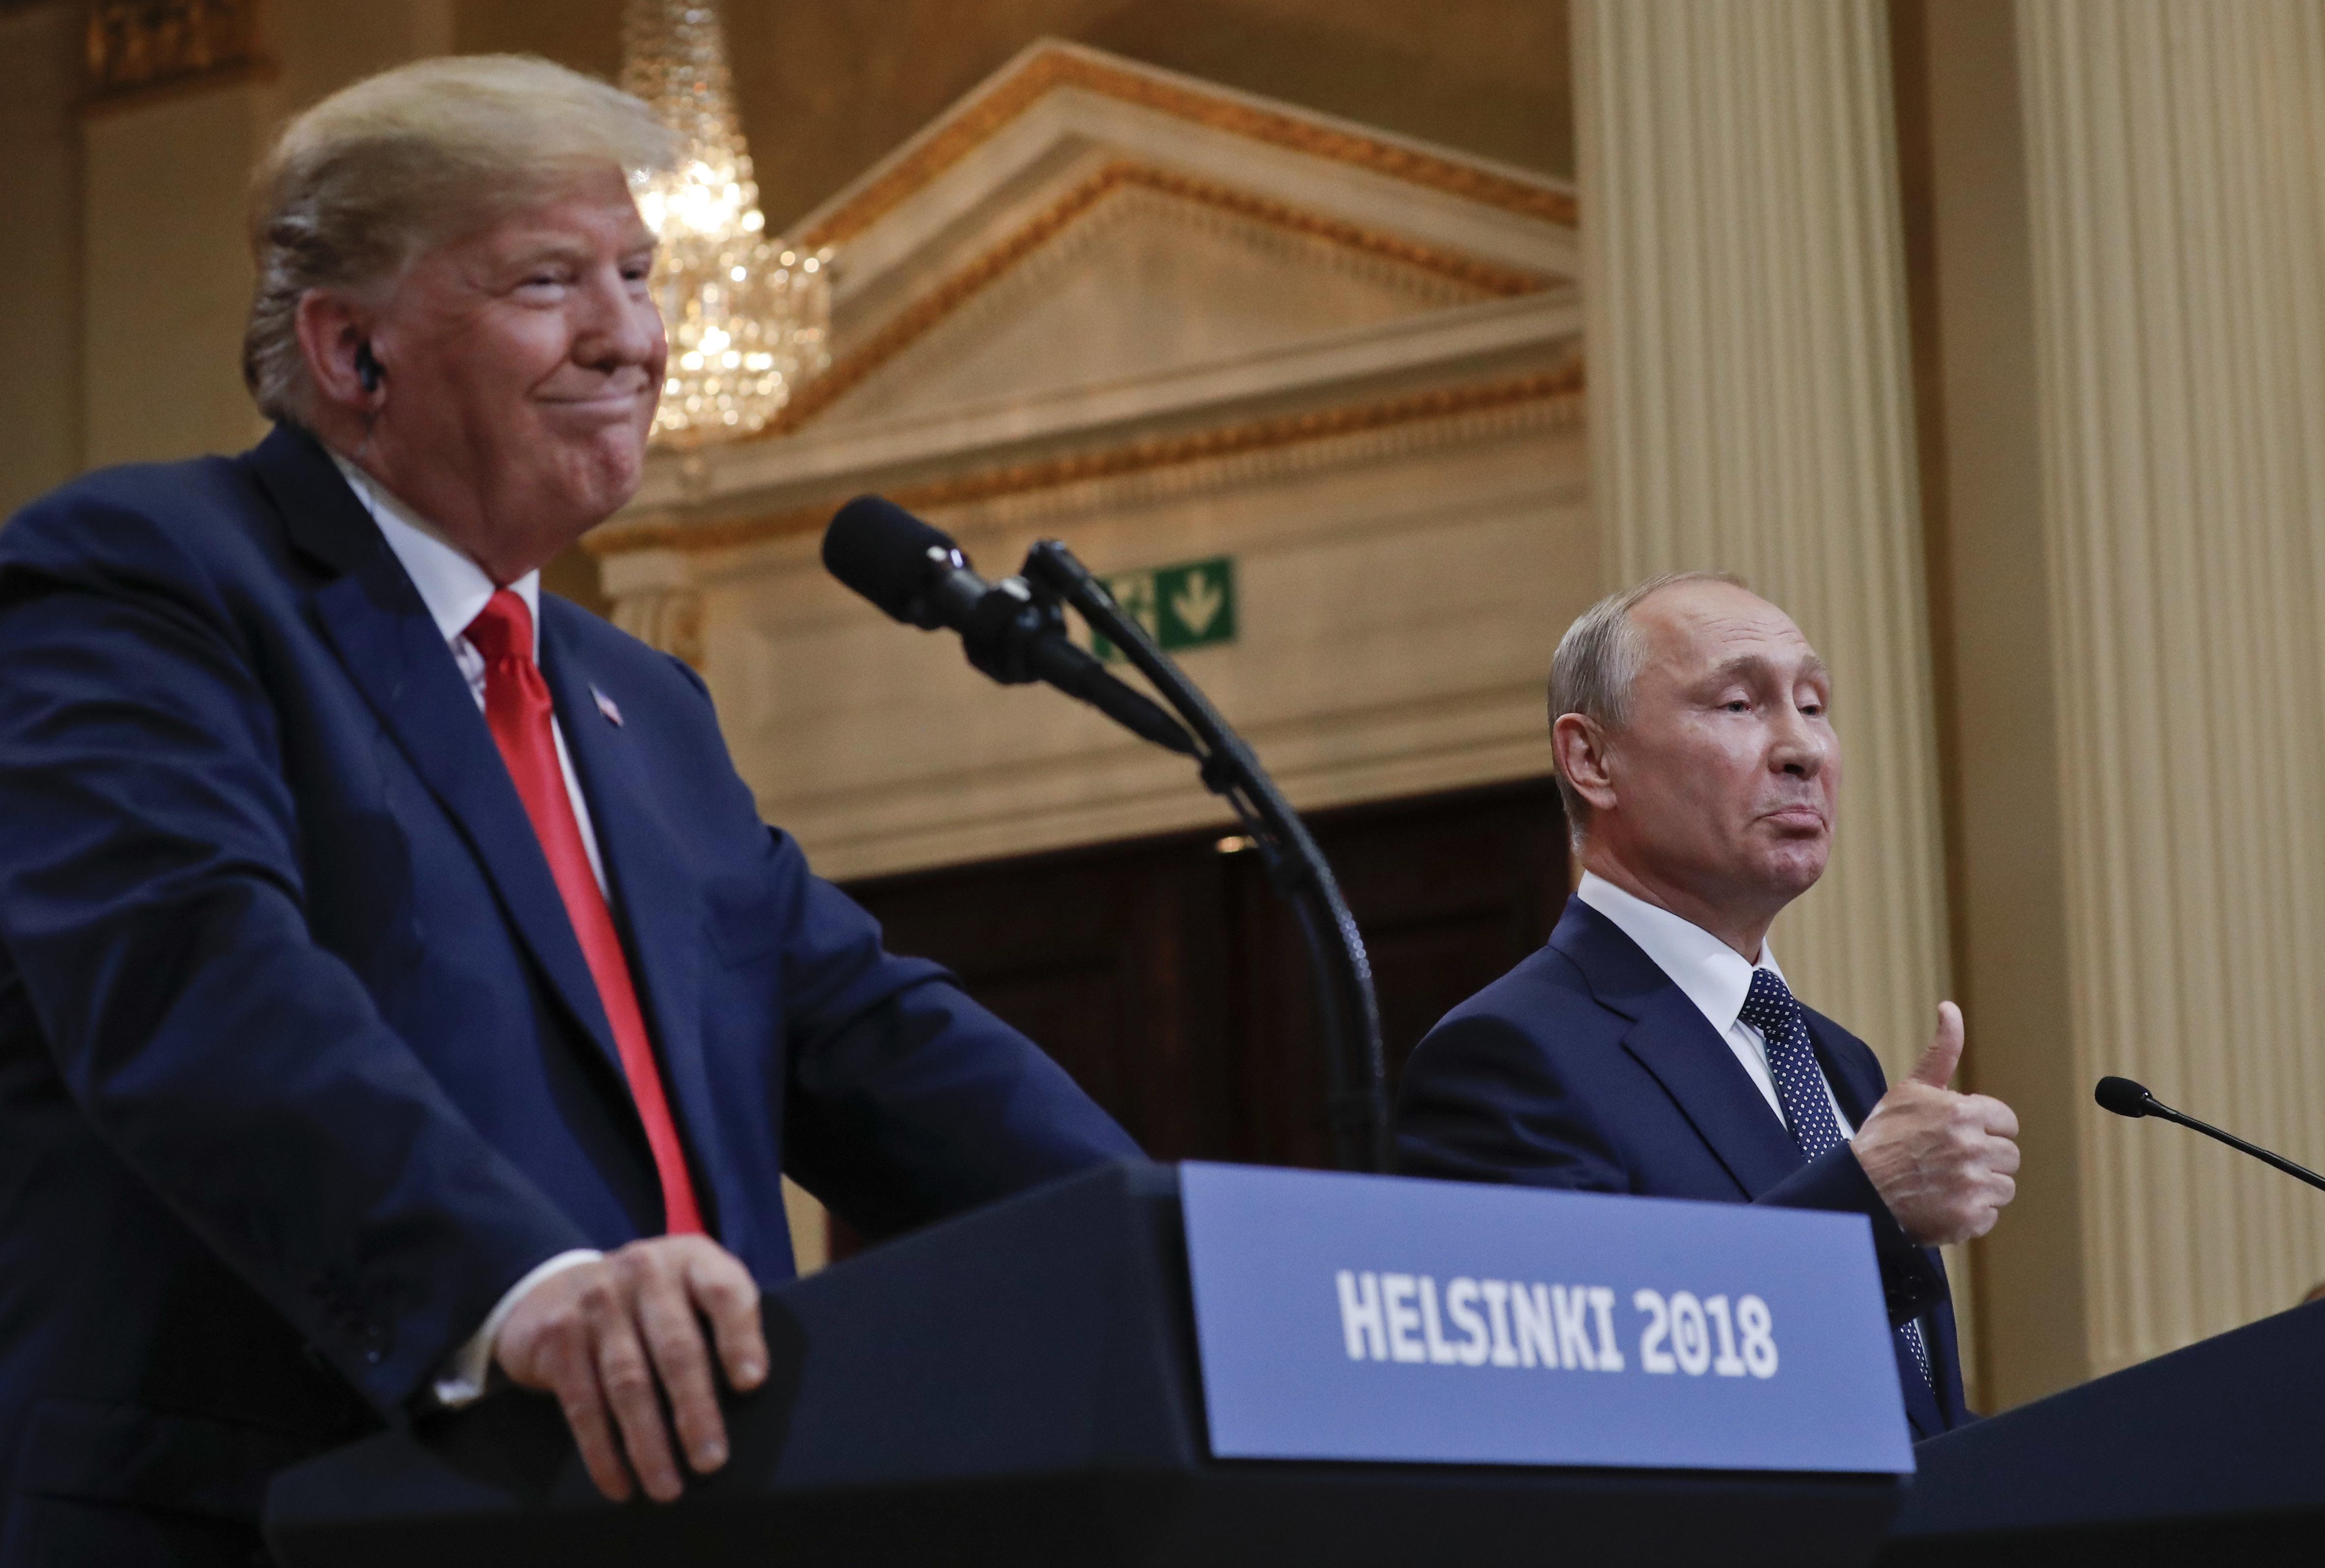 Putin and Trump at Helskini Press Conference